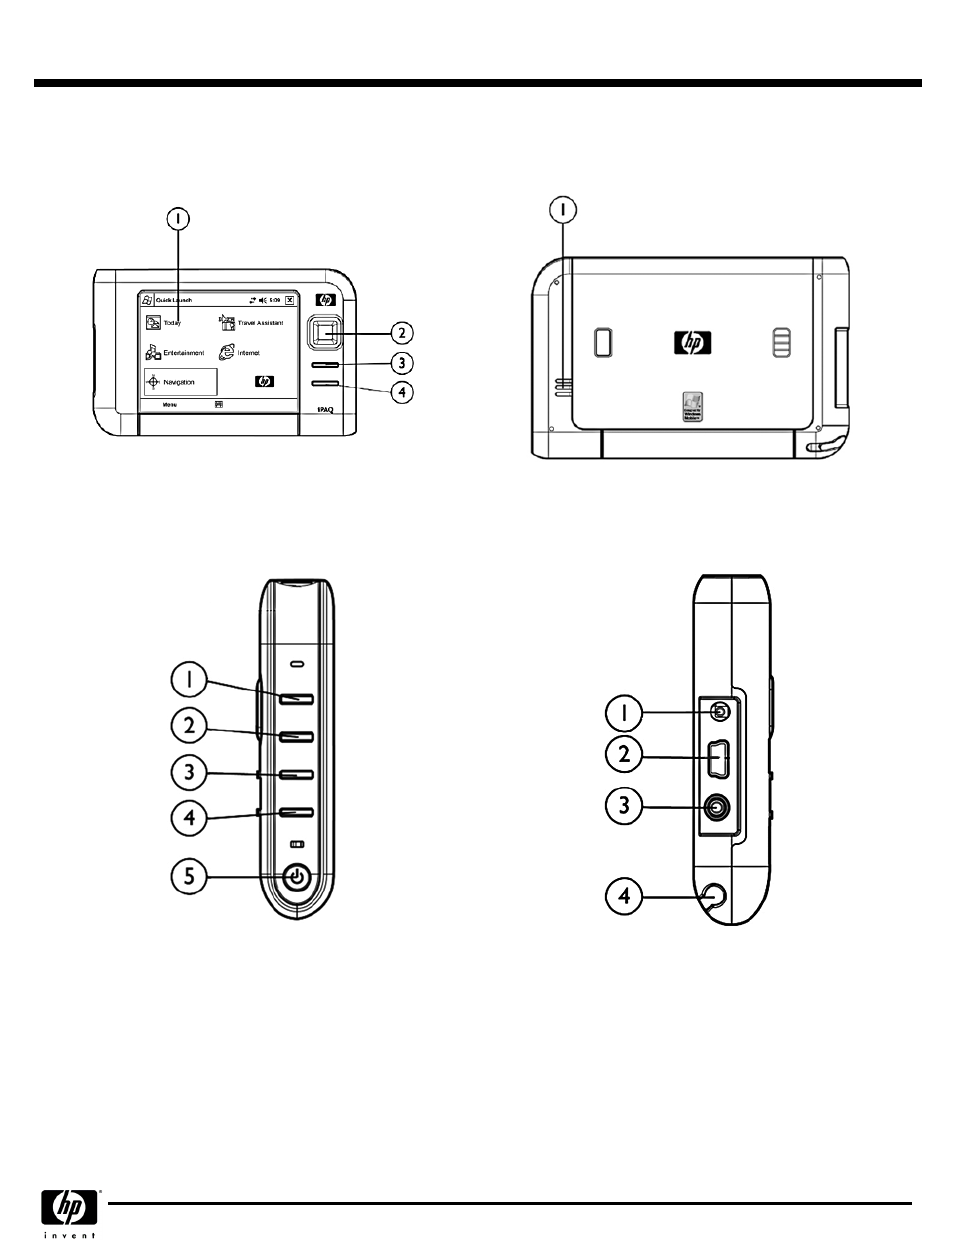 hp ipaq travel companion rx5000 user manual